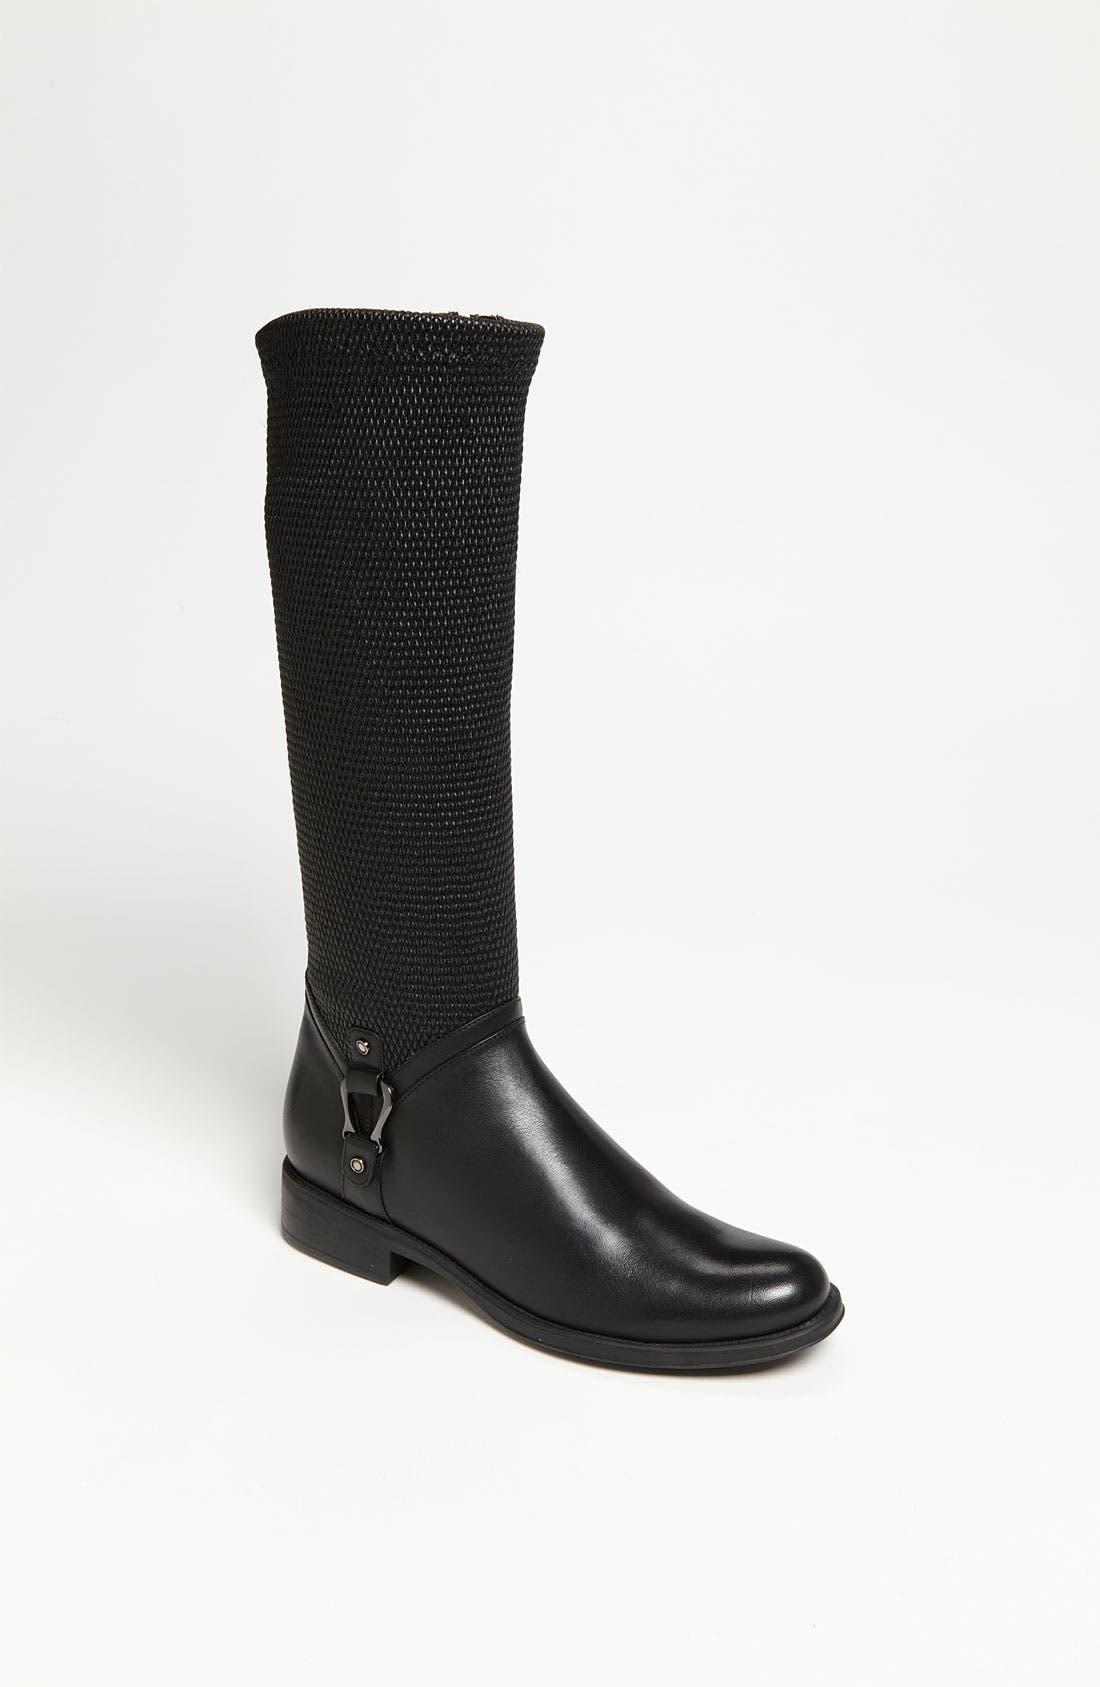 Alternate Image 1 Selected - Blondo 'Vergara' Waterproof Boot (Nordstrom Exclusive)